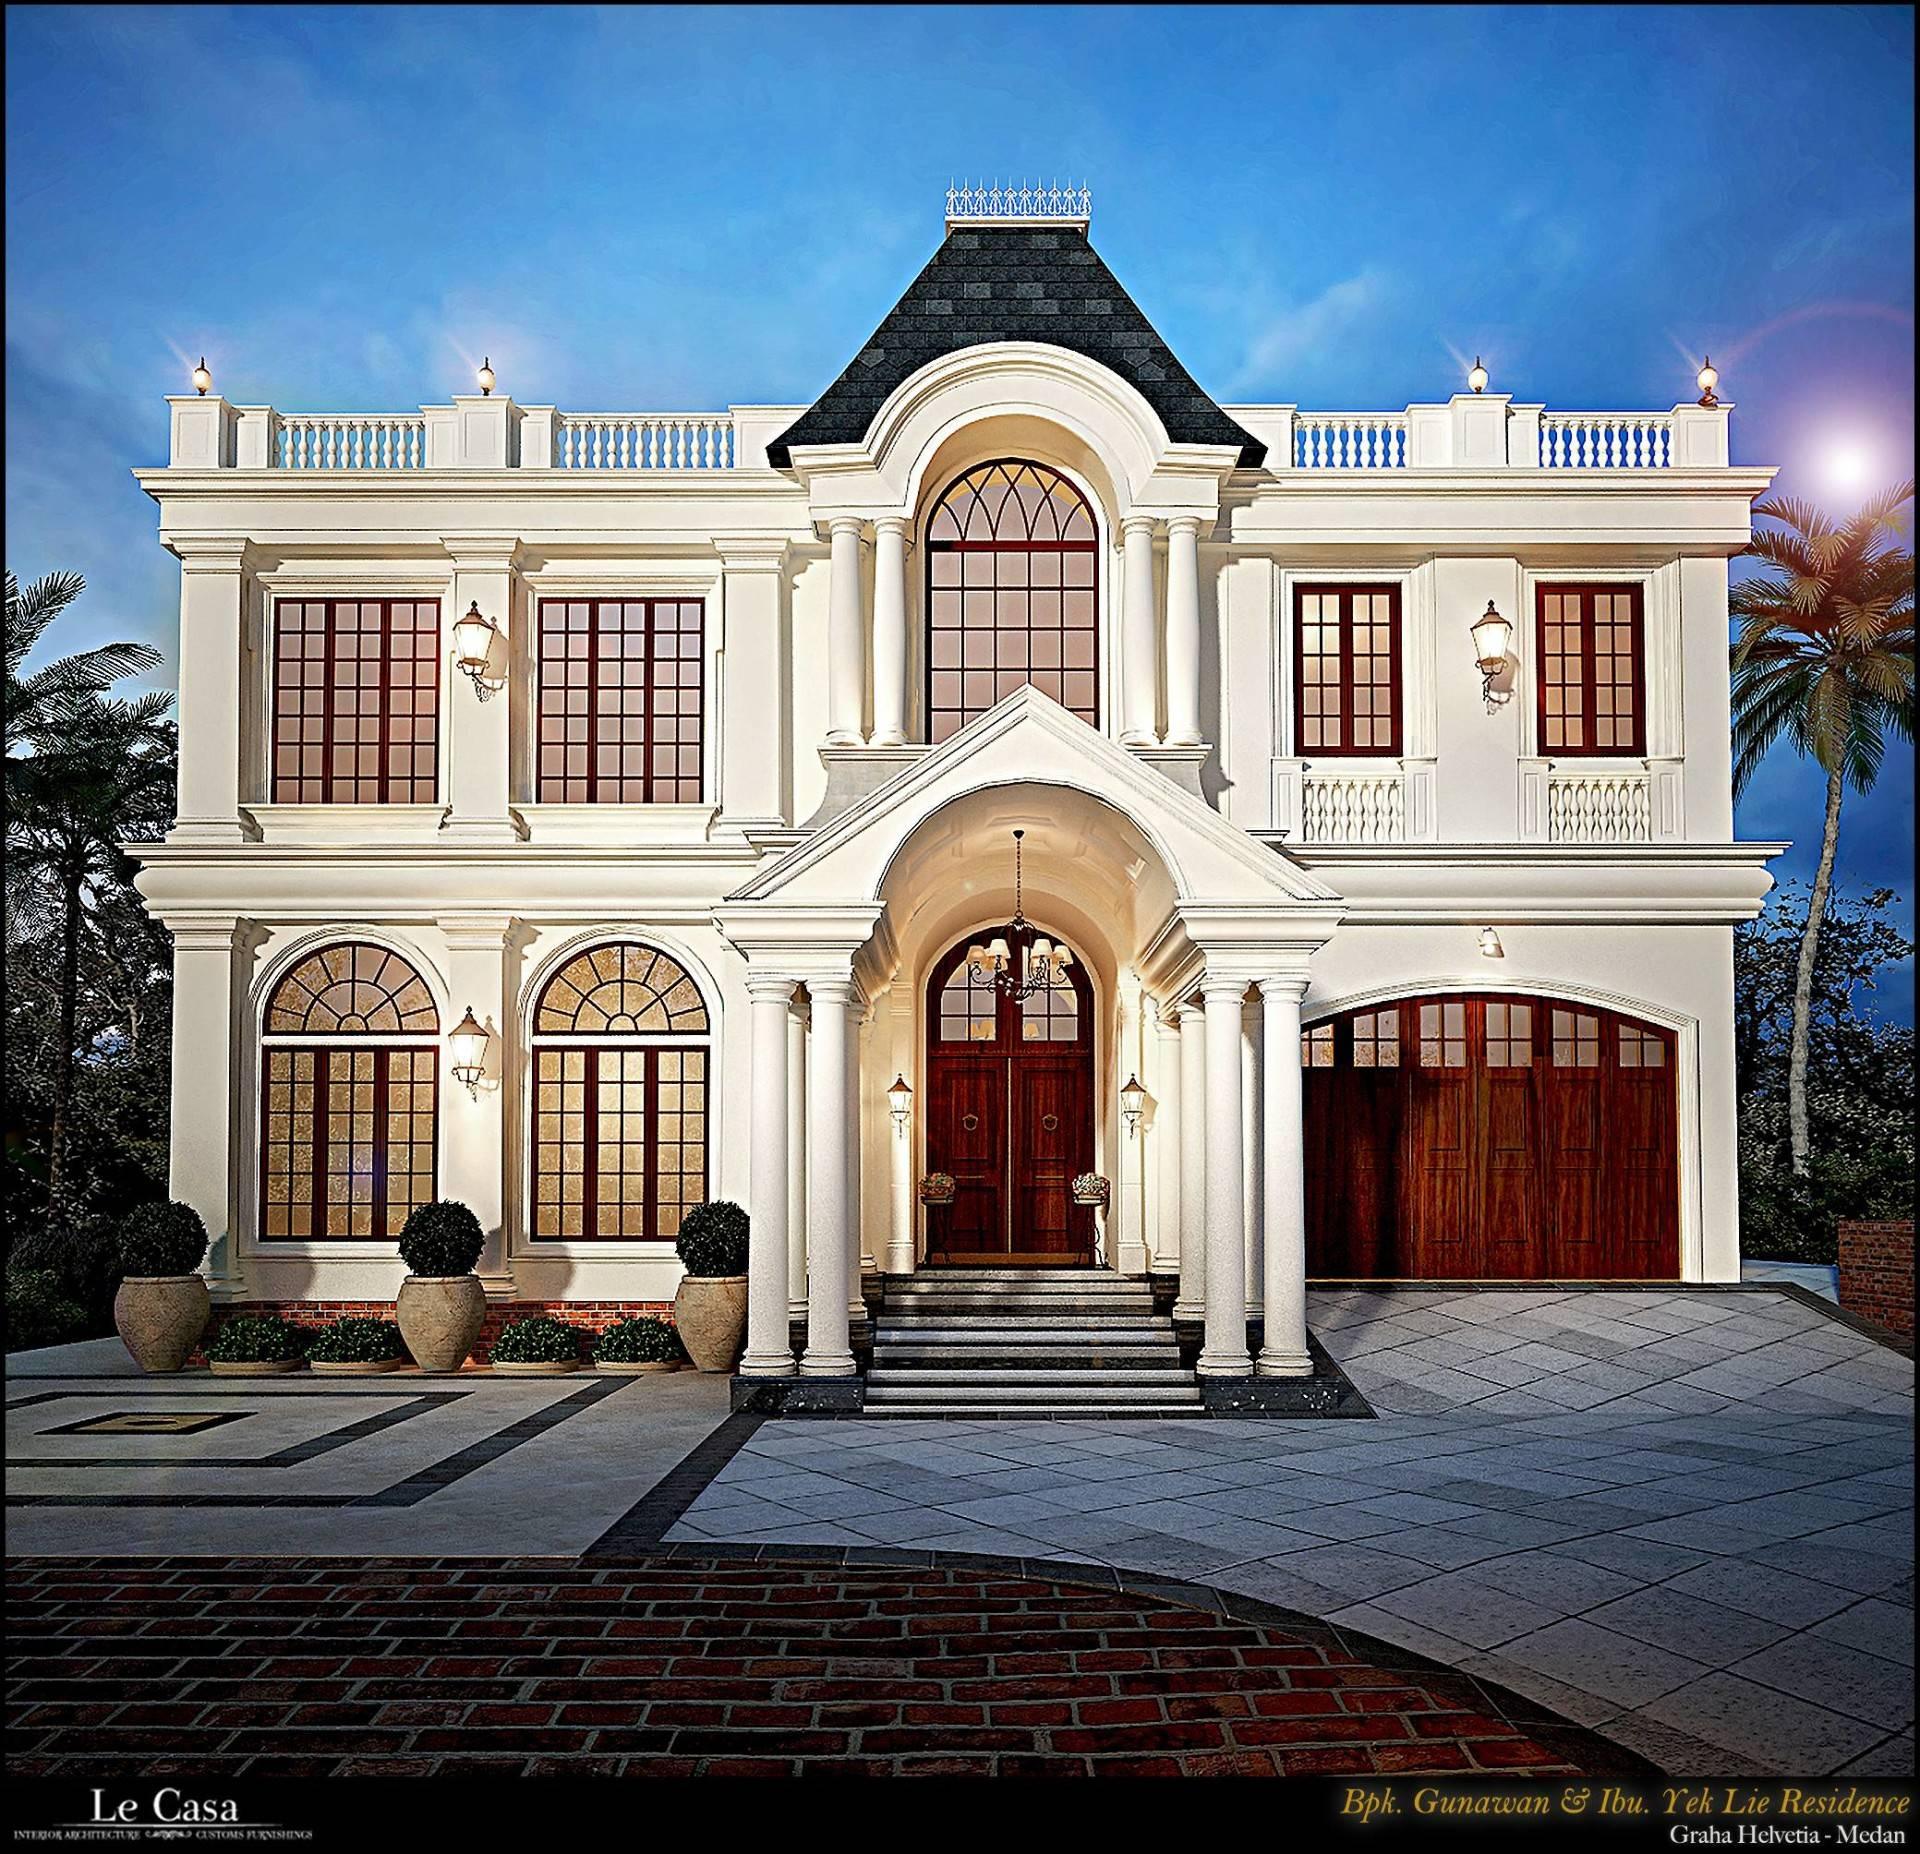 Emilia Oei Collonial Mansion Medan, Indonesia Medan, Indonesia Front View   5600